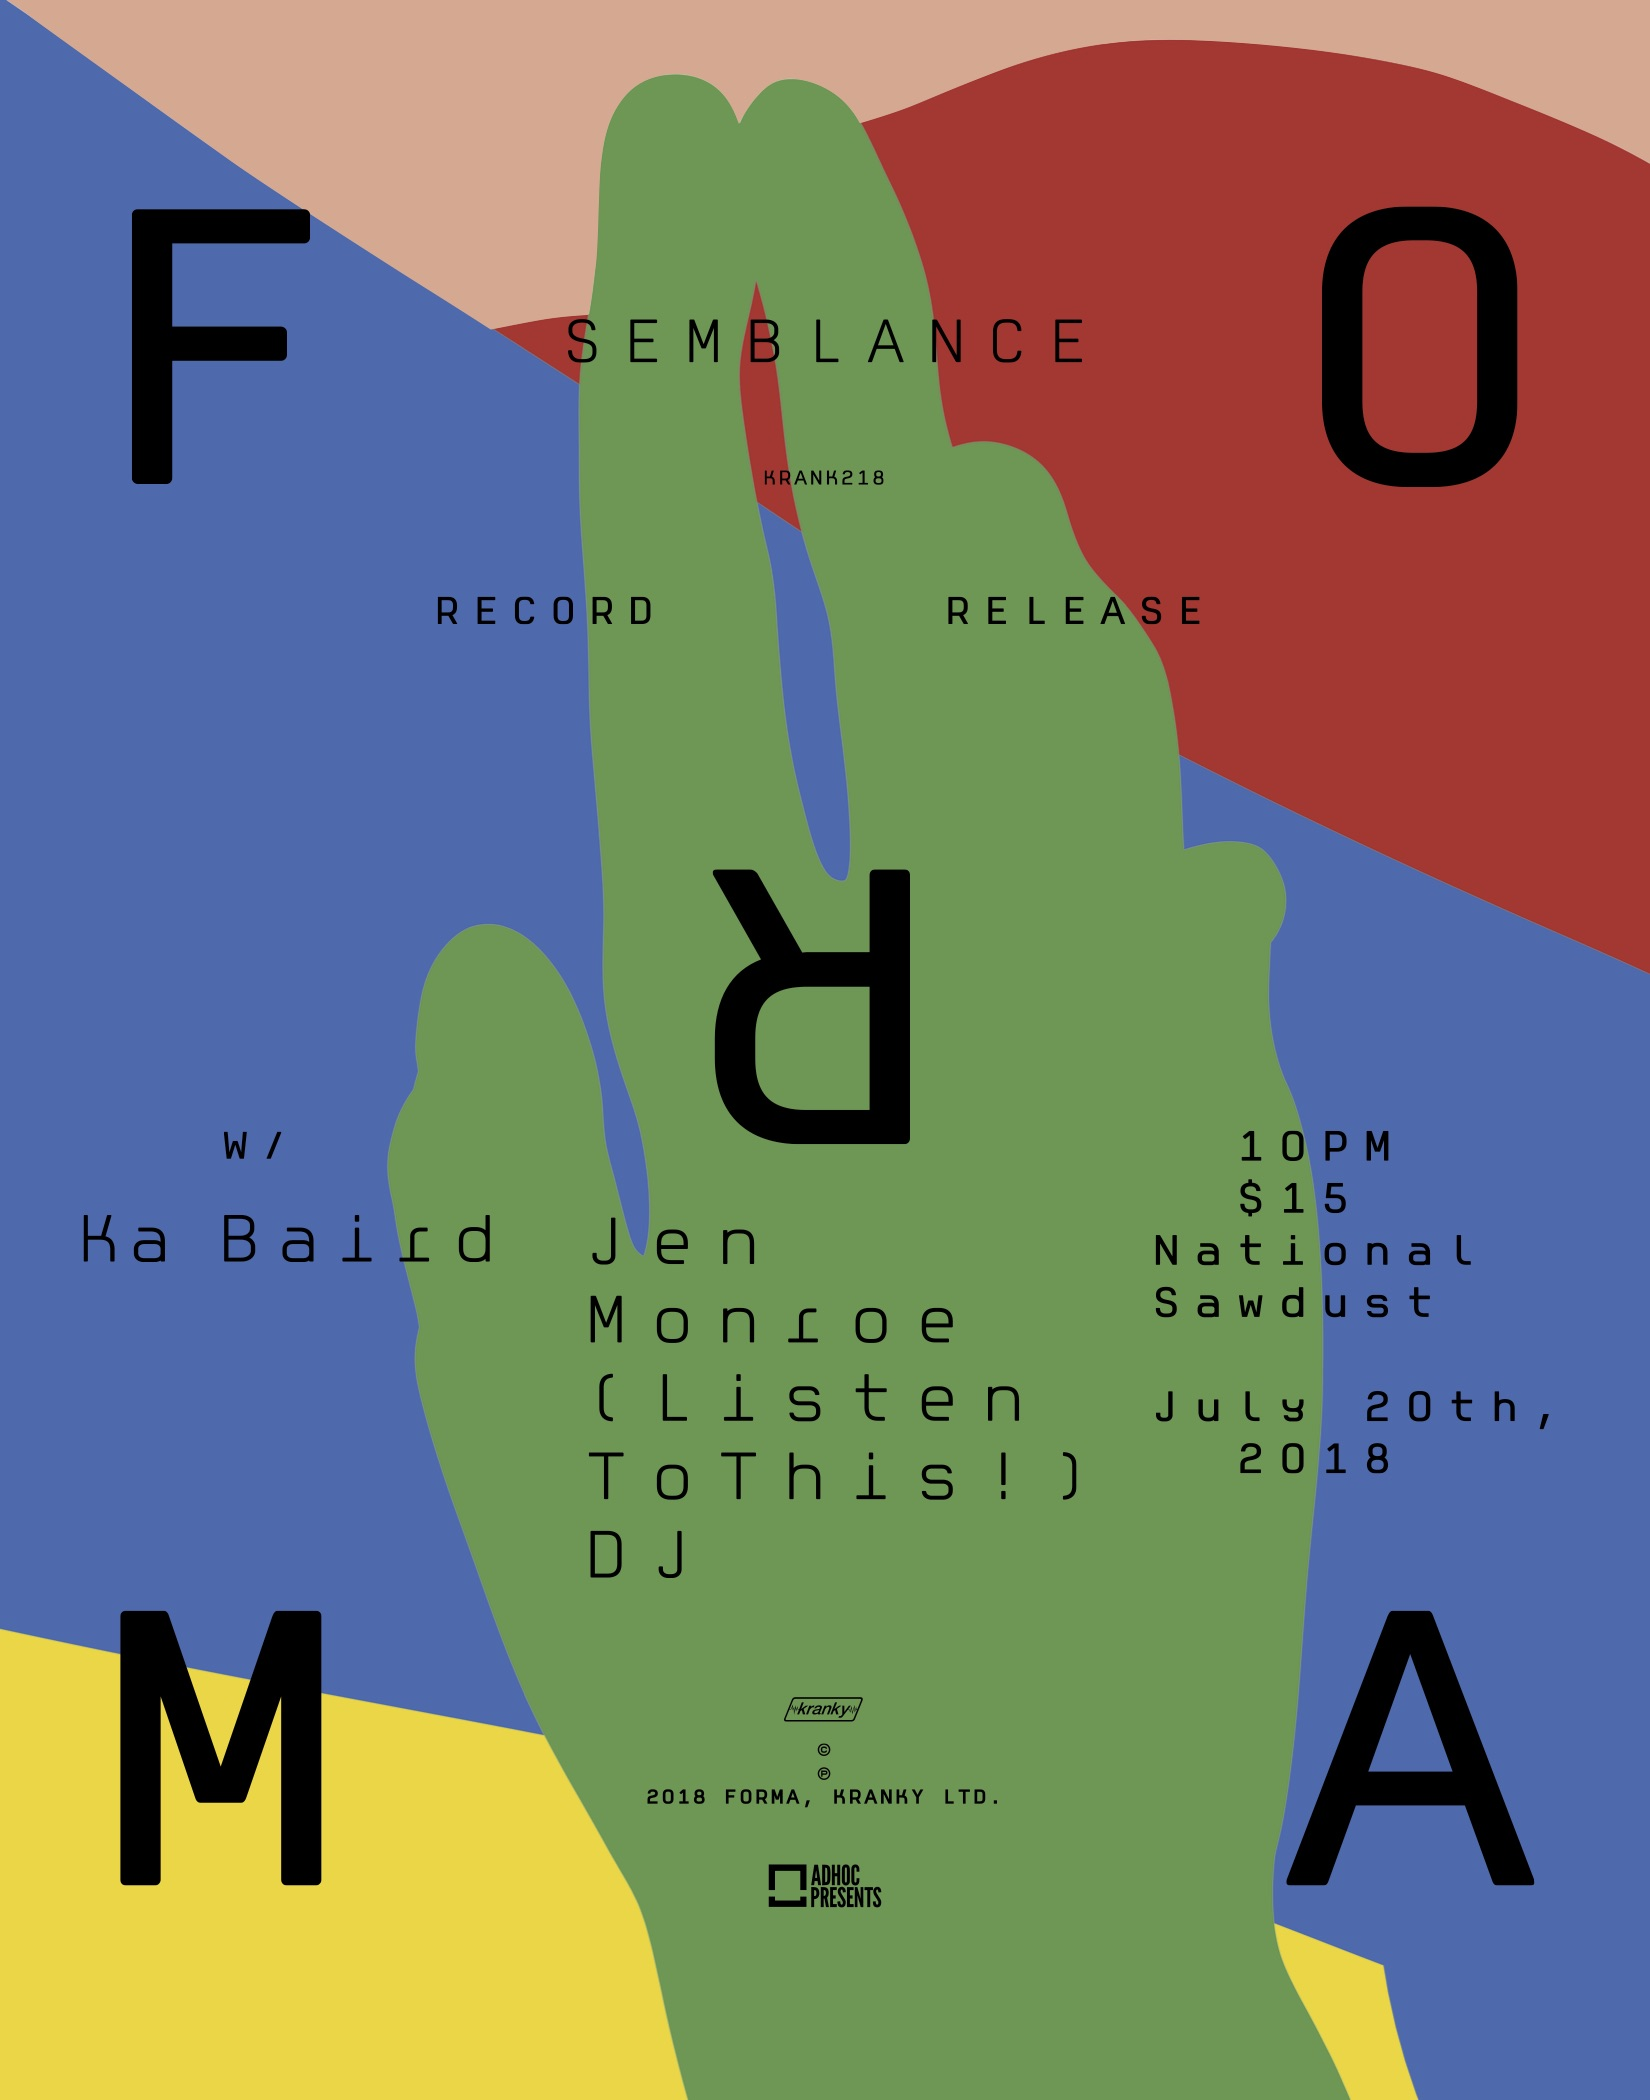 FormaSemblanceRecordRelease_02b_11x14.jpg